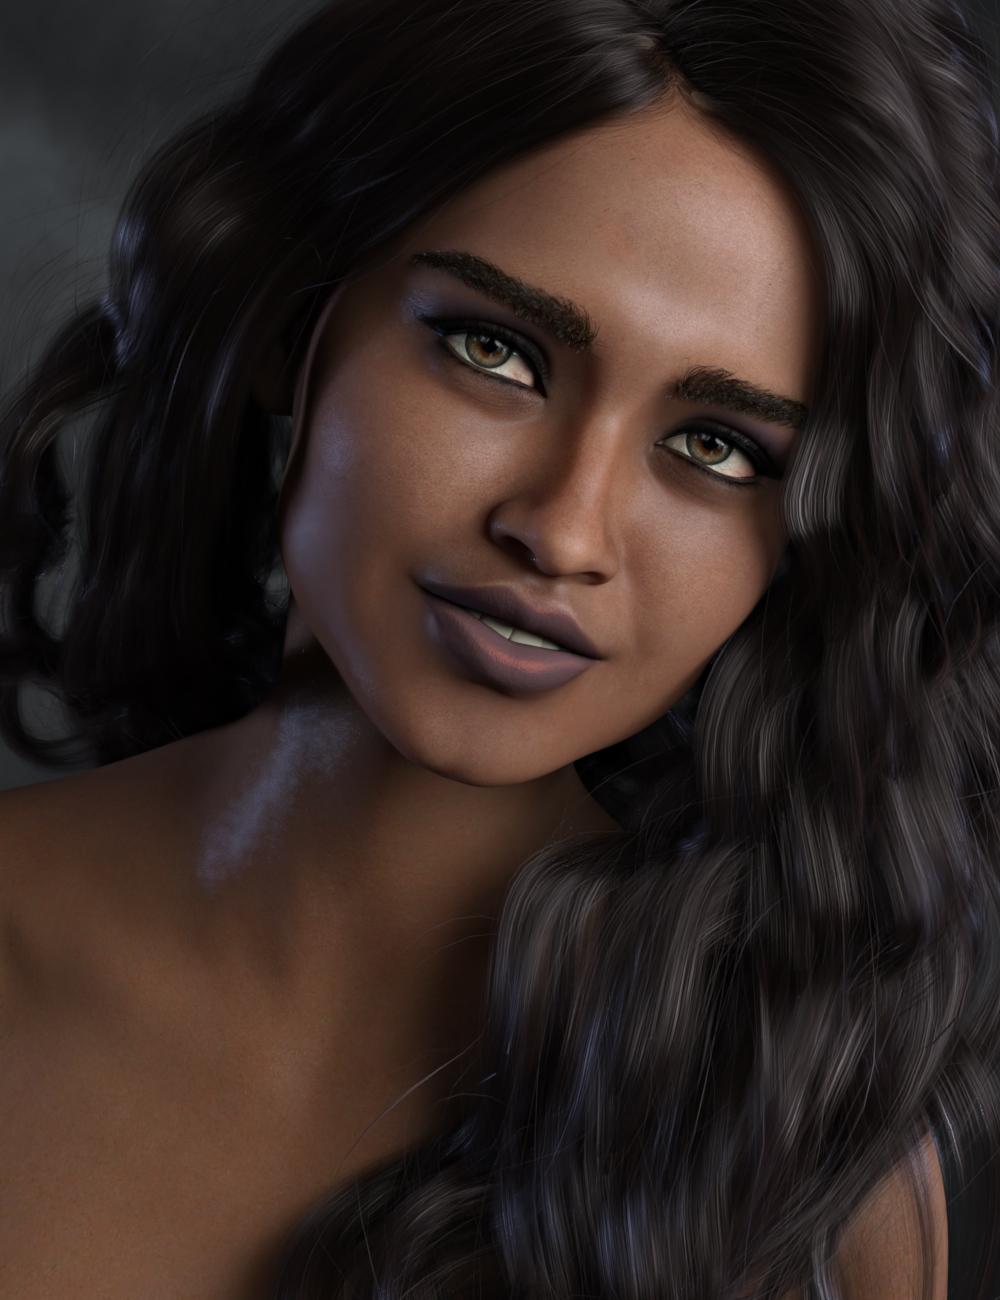 Micaela for Gabriela 8 by: SR3, 3D Models by Daz 3D